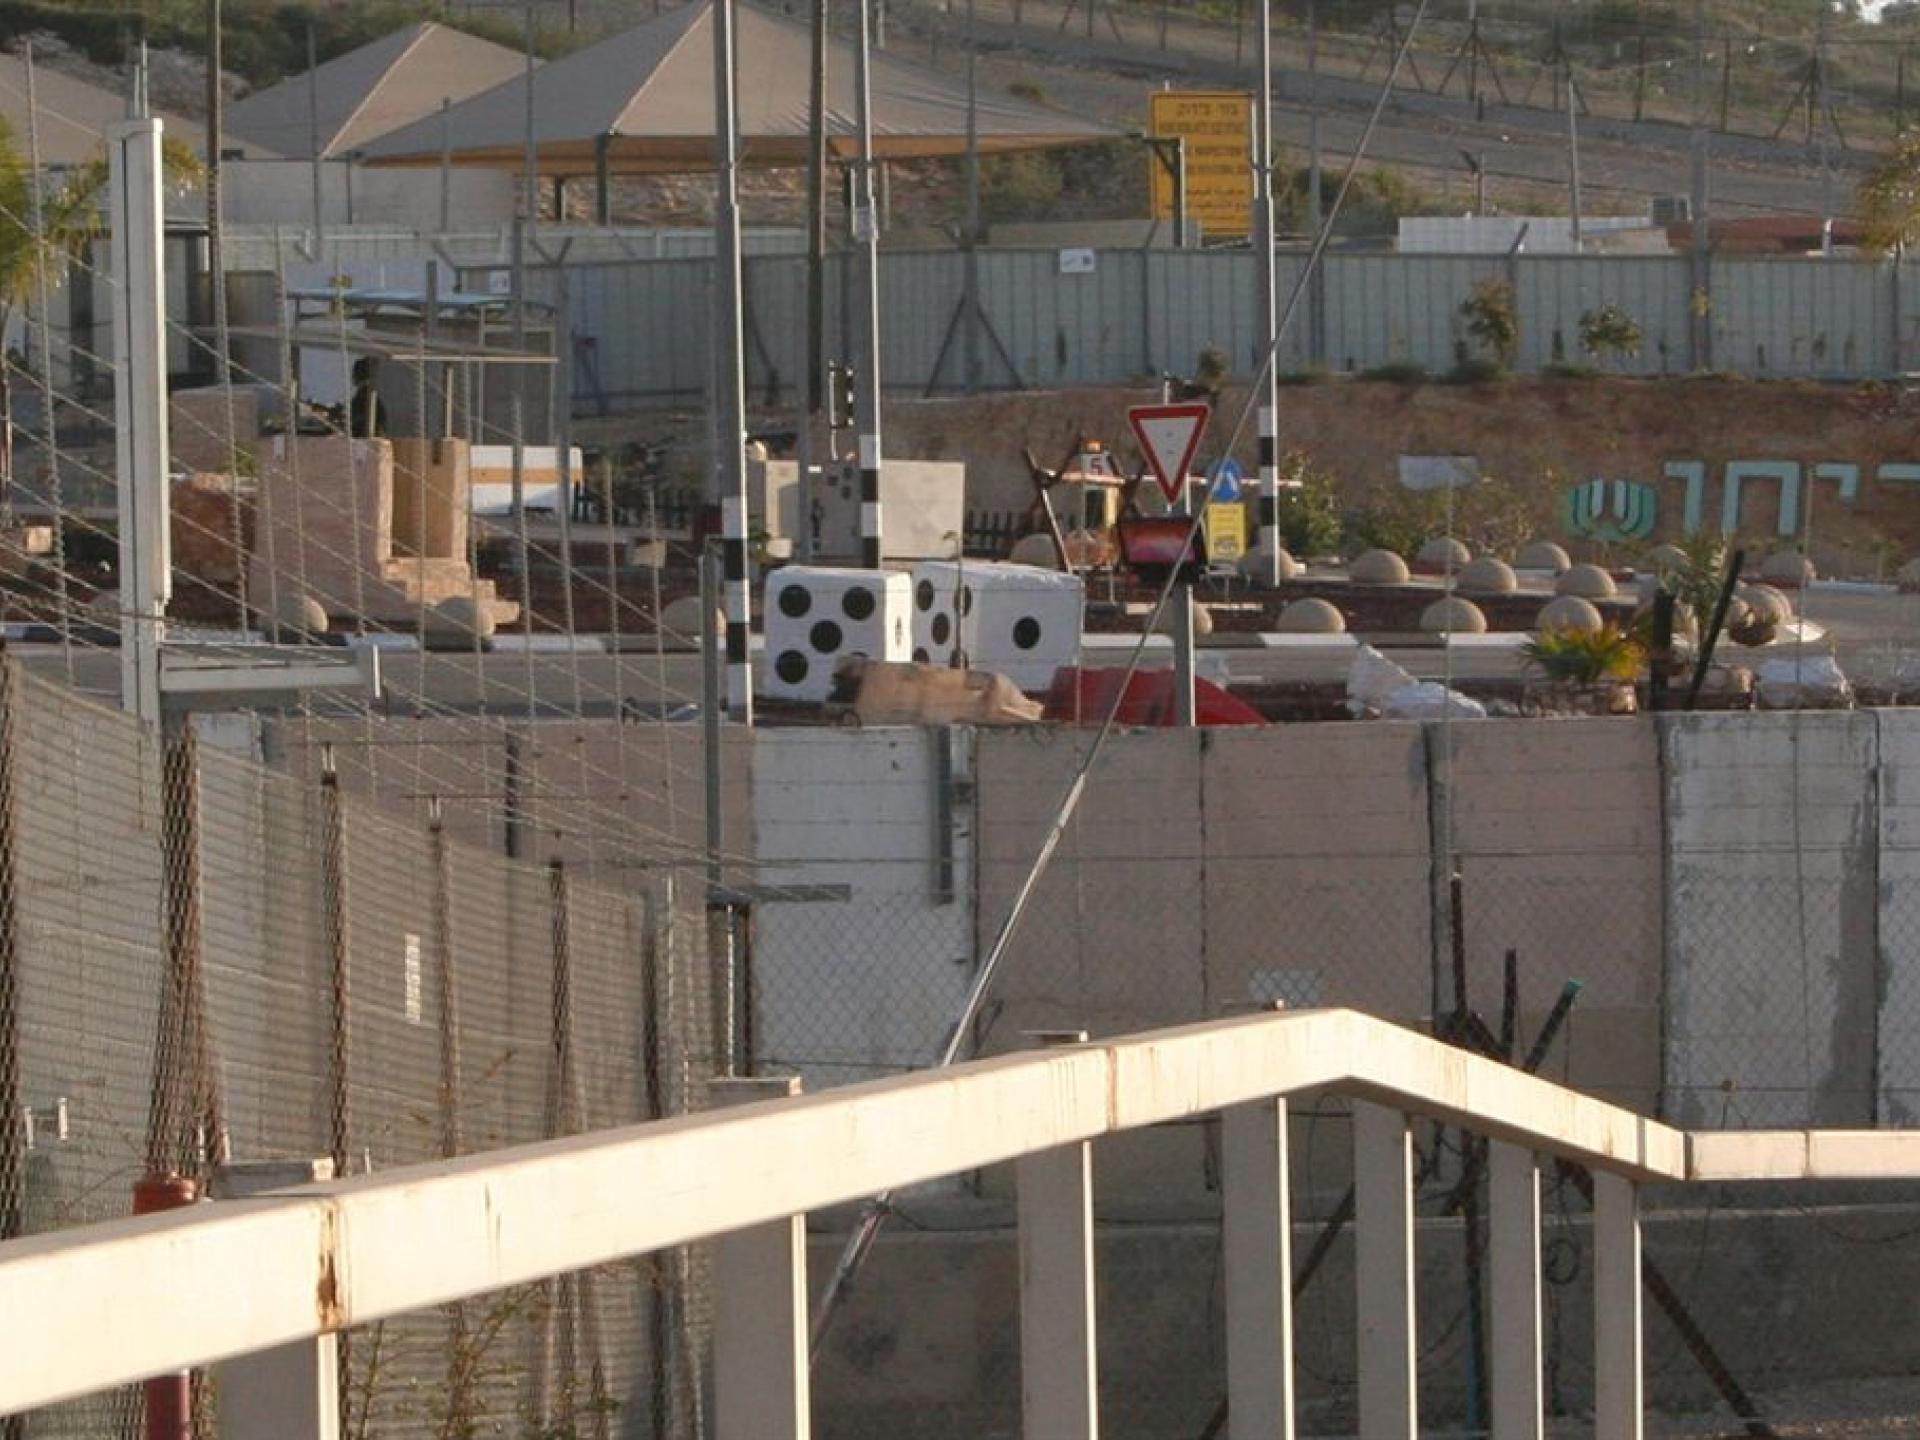 Barta'a/Reikhan checkpoint 20.02.10